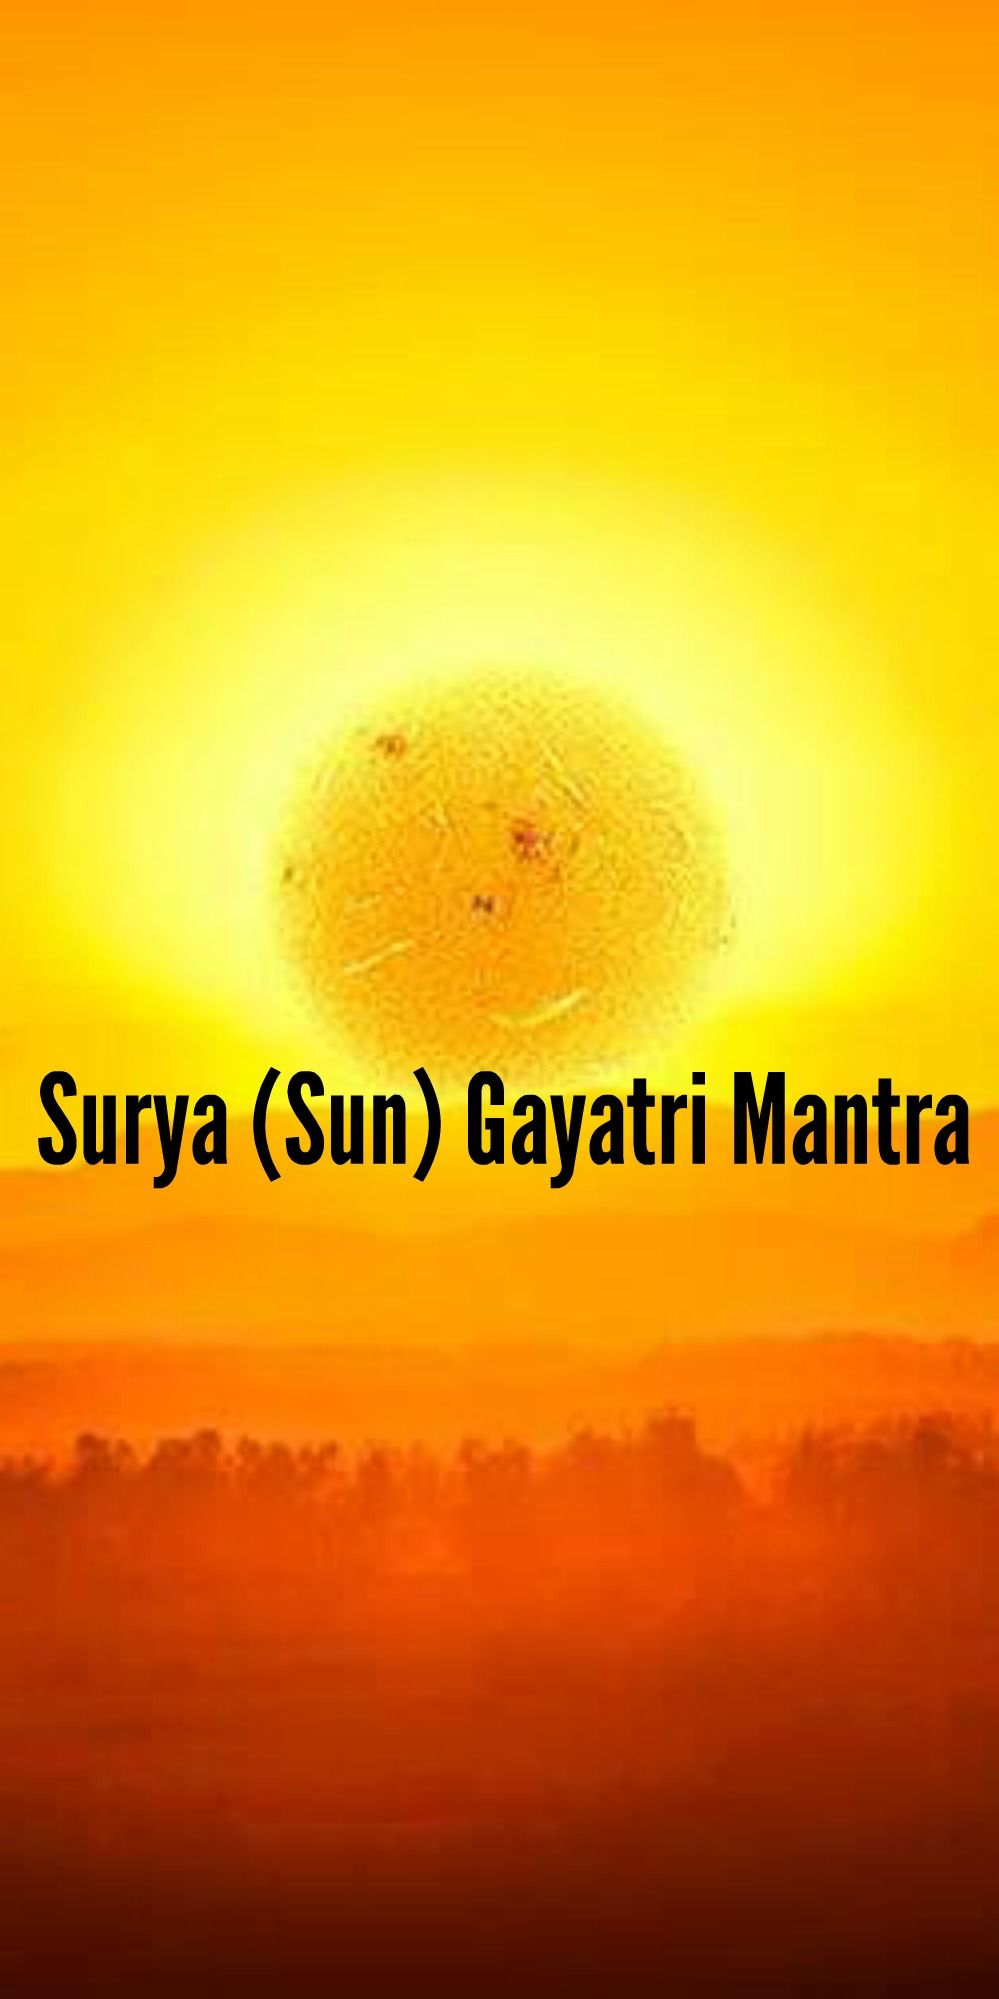 Surya Sun Gayatri Mantra Lyrics Meaning And Benefits Buddha